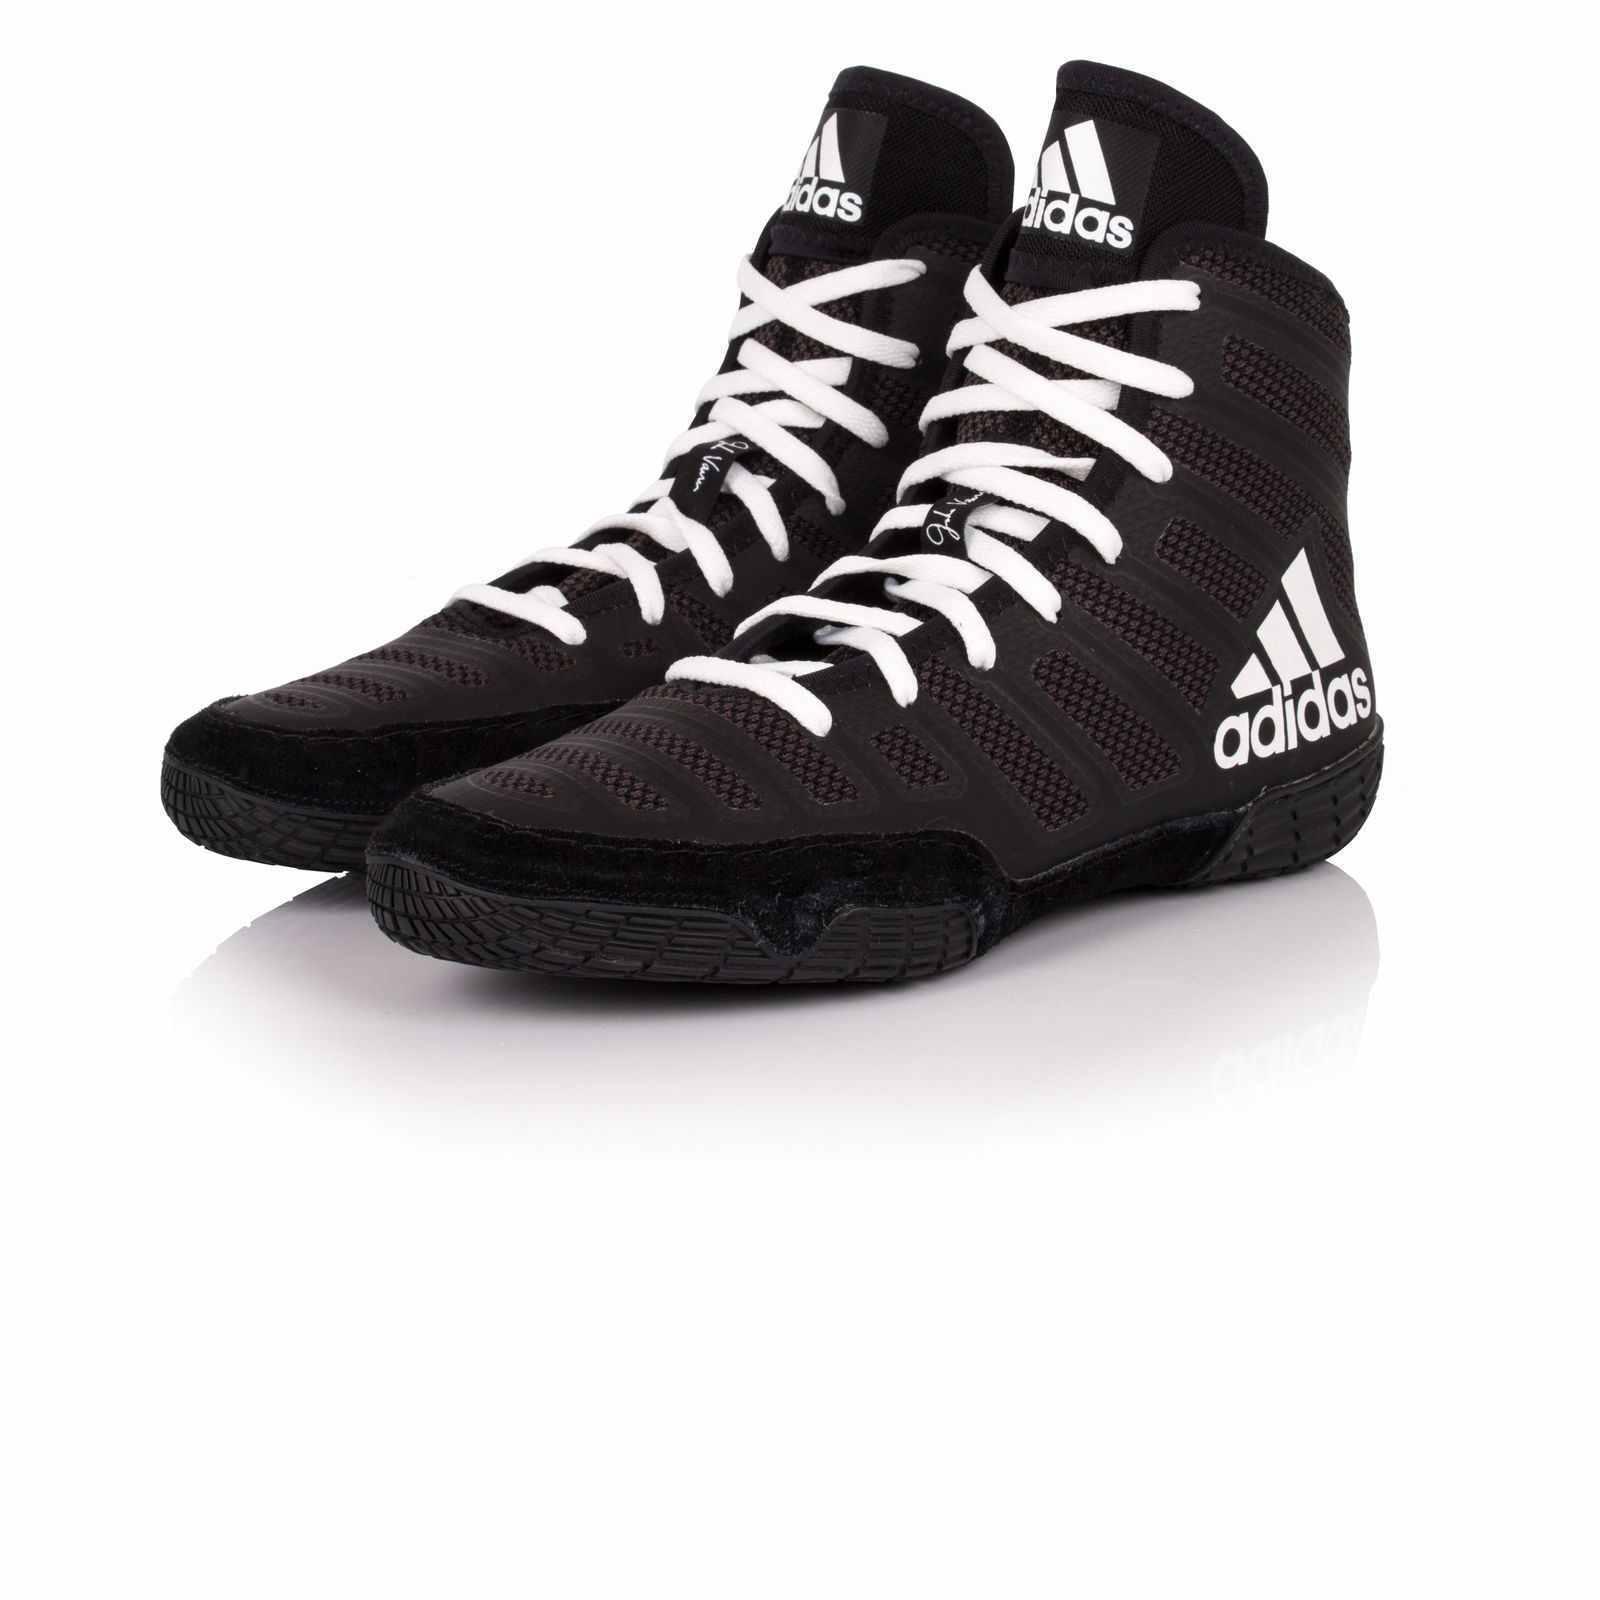 Adidas Adizero Varner Wrestling shoes Black & White Boots Trainers Pumps